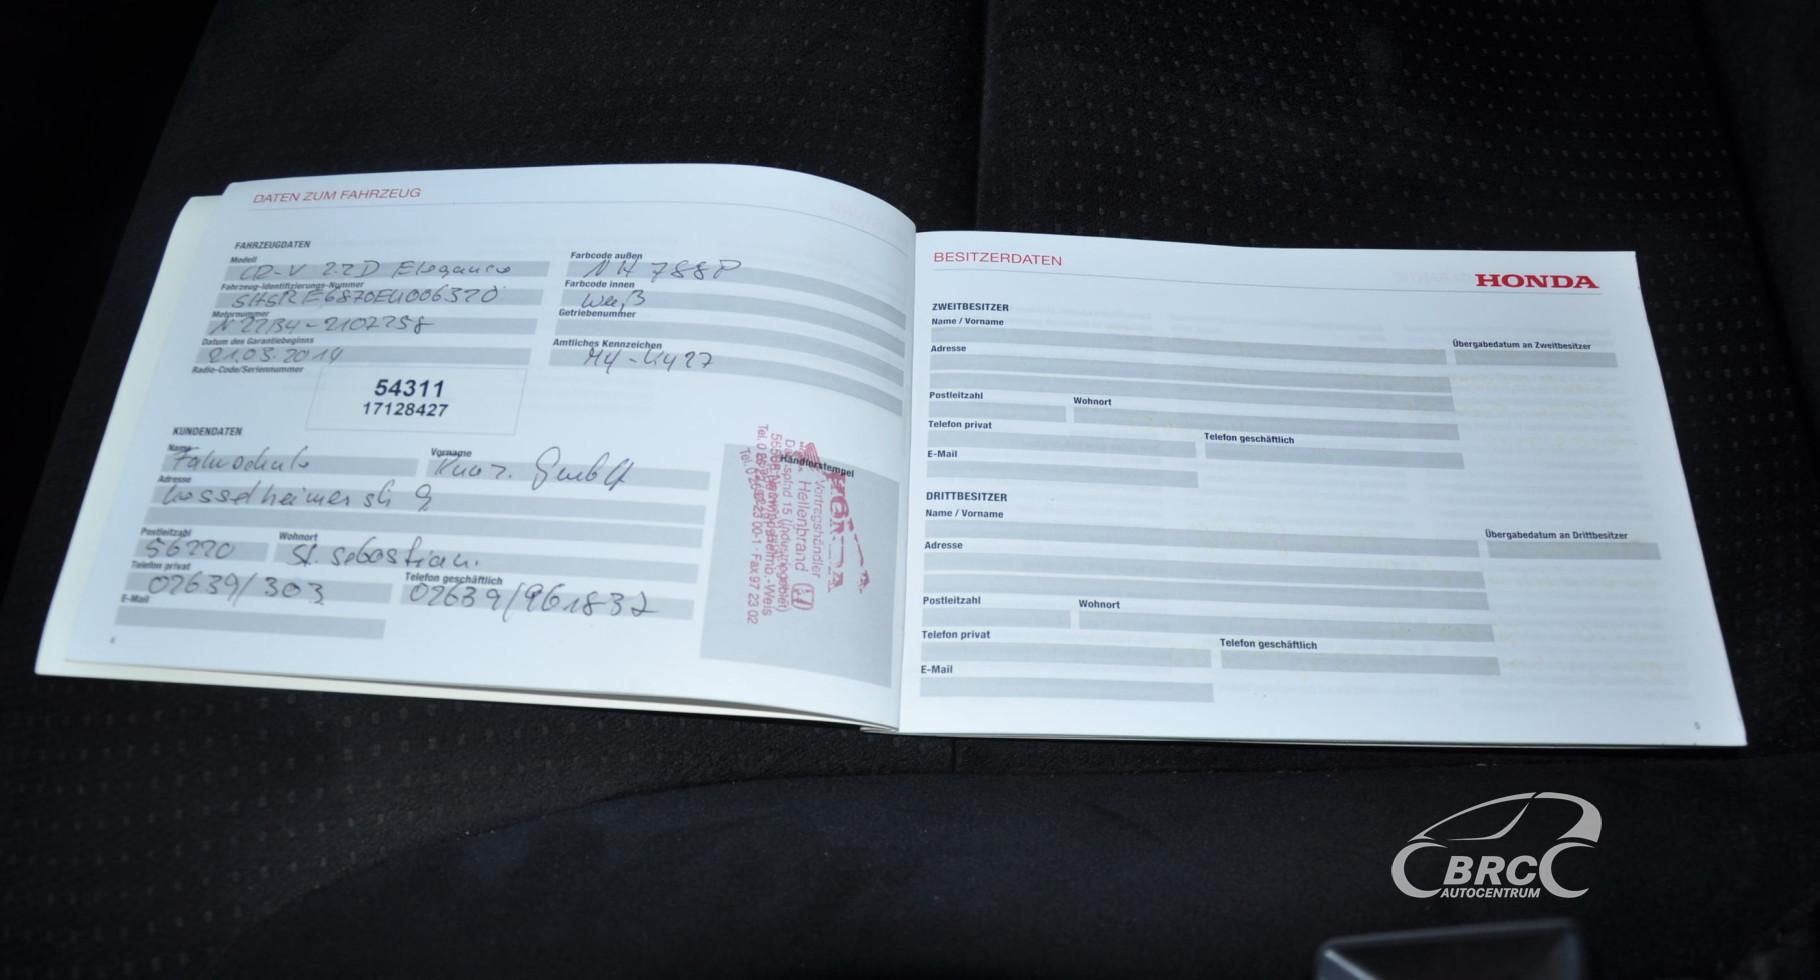 Honda CR-V 2.2 i-DTEC Automatas (ID: 798076) | BRC Autocentrum